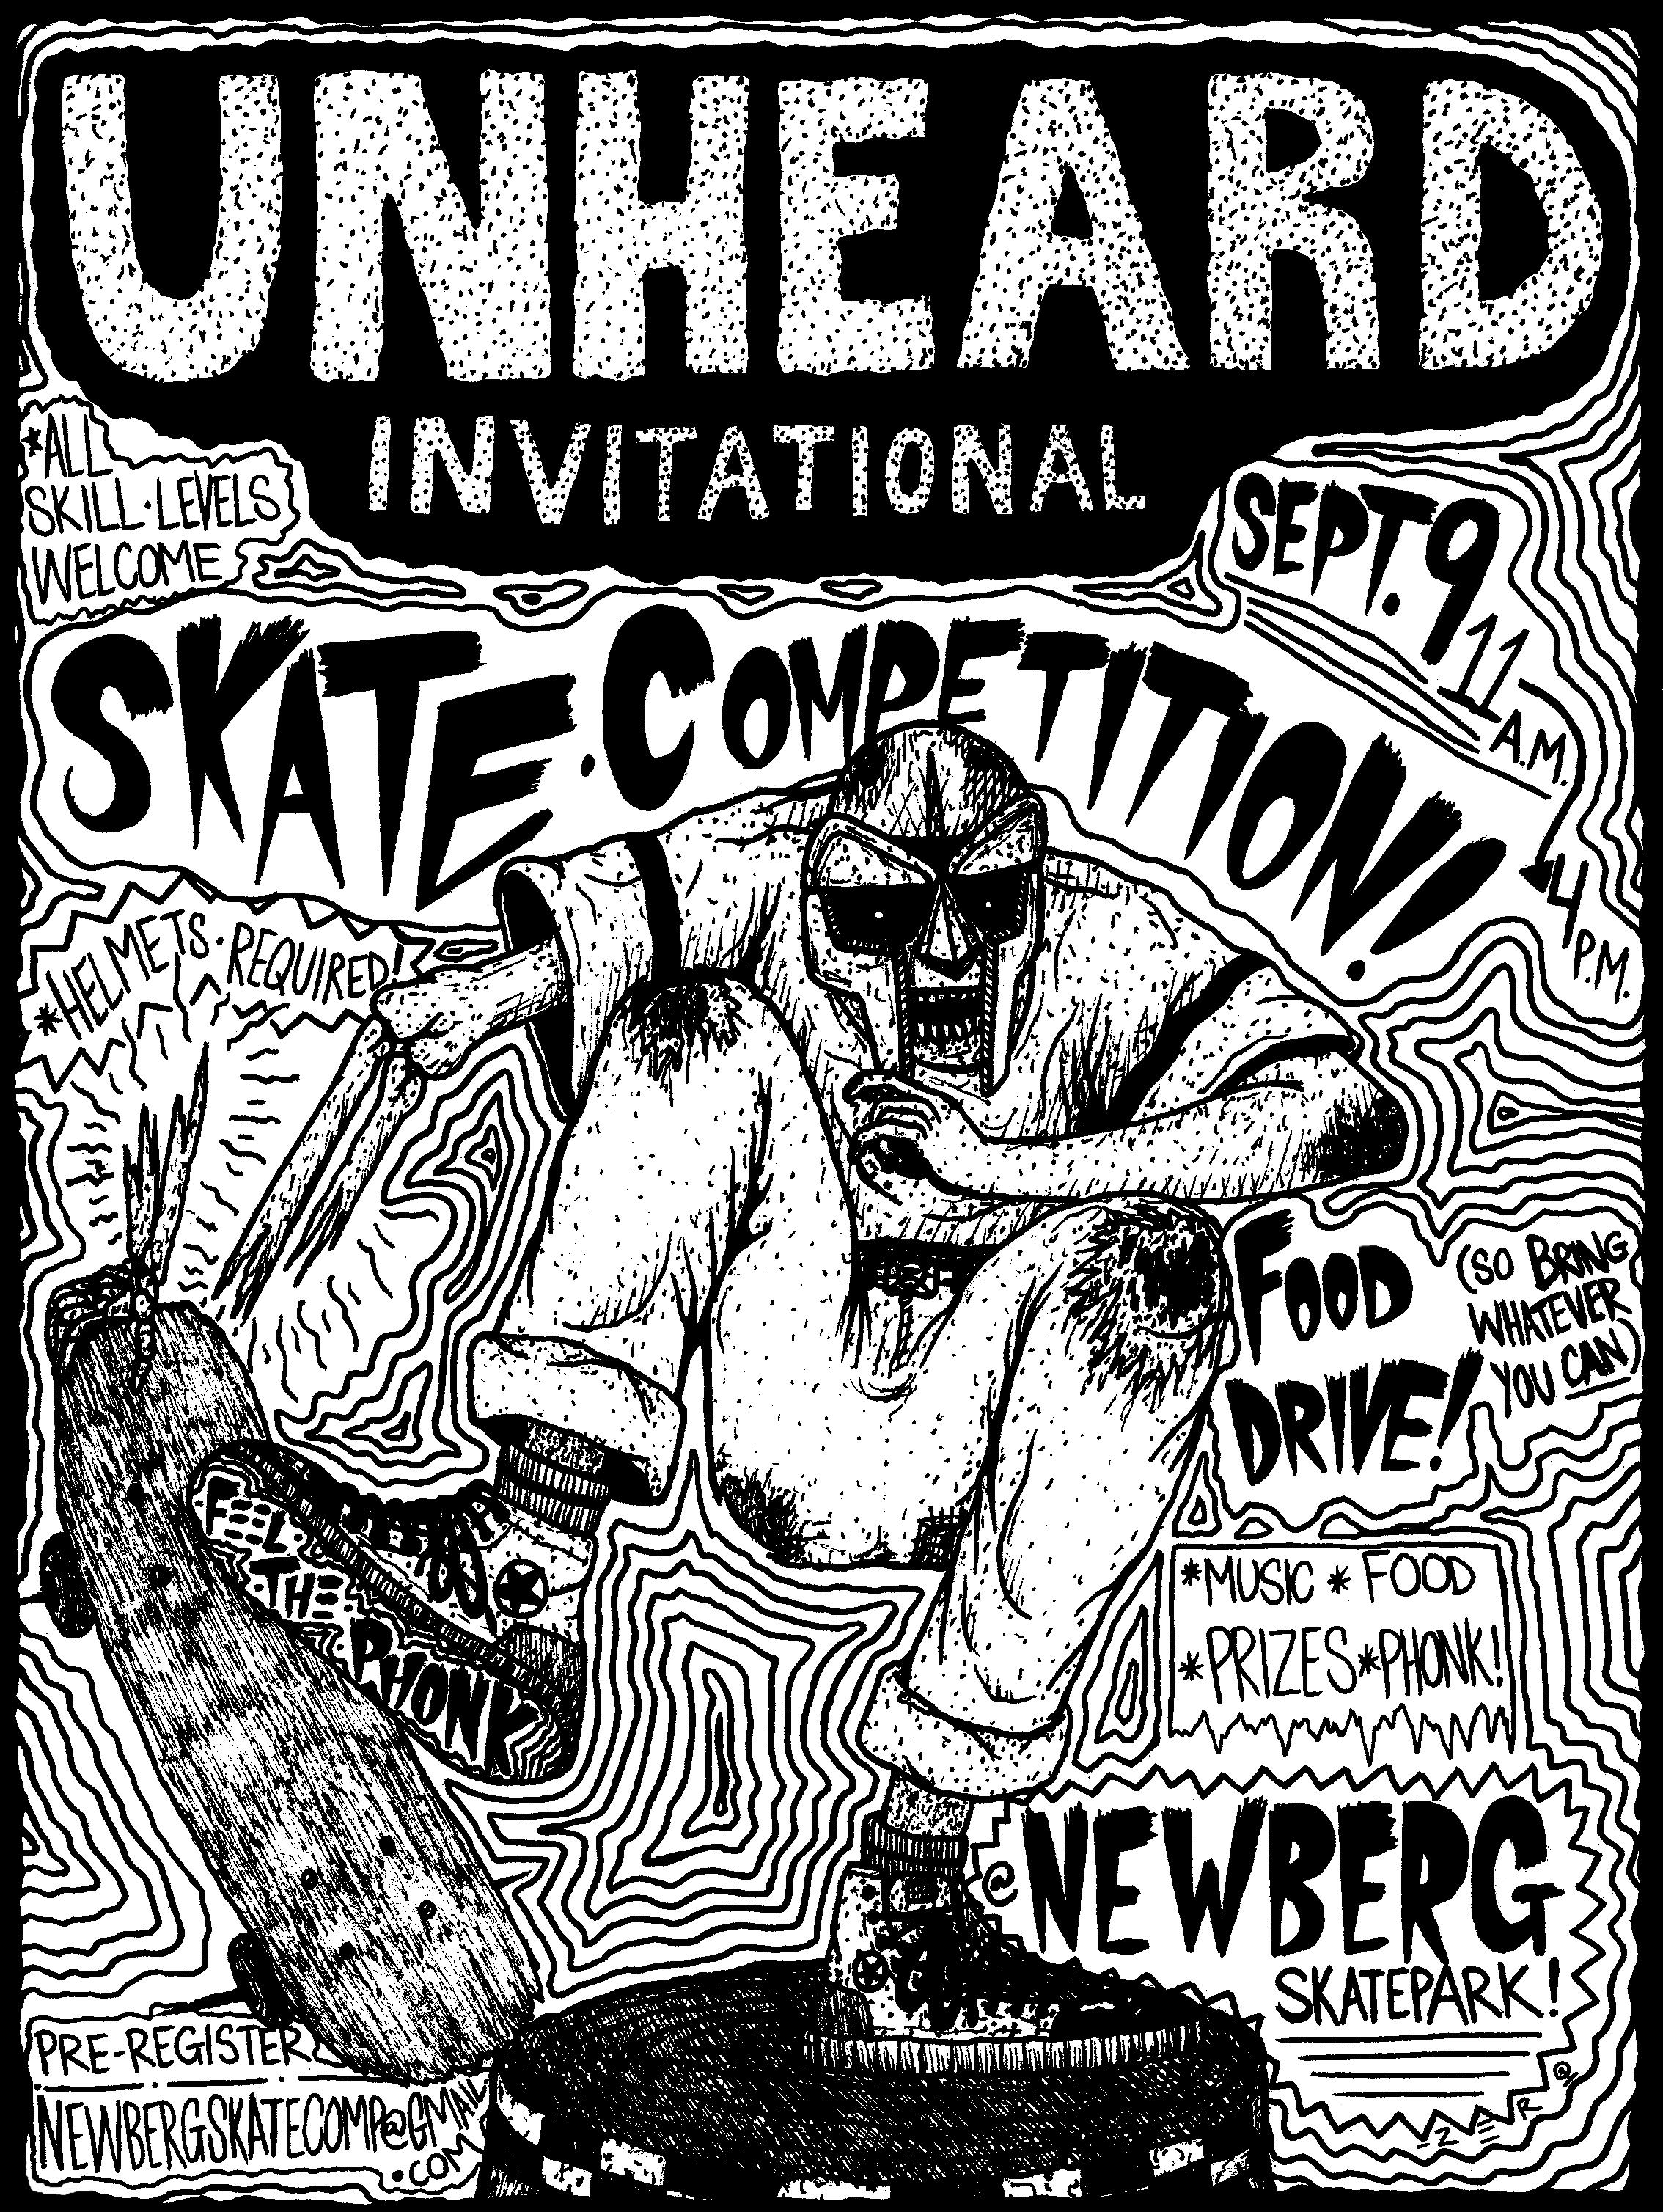 Newberg Skate Comp Flyer